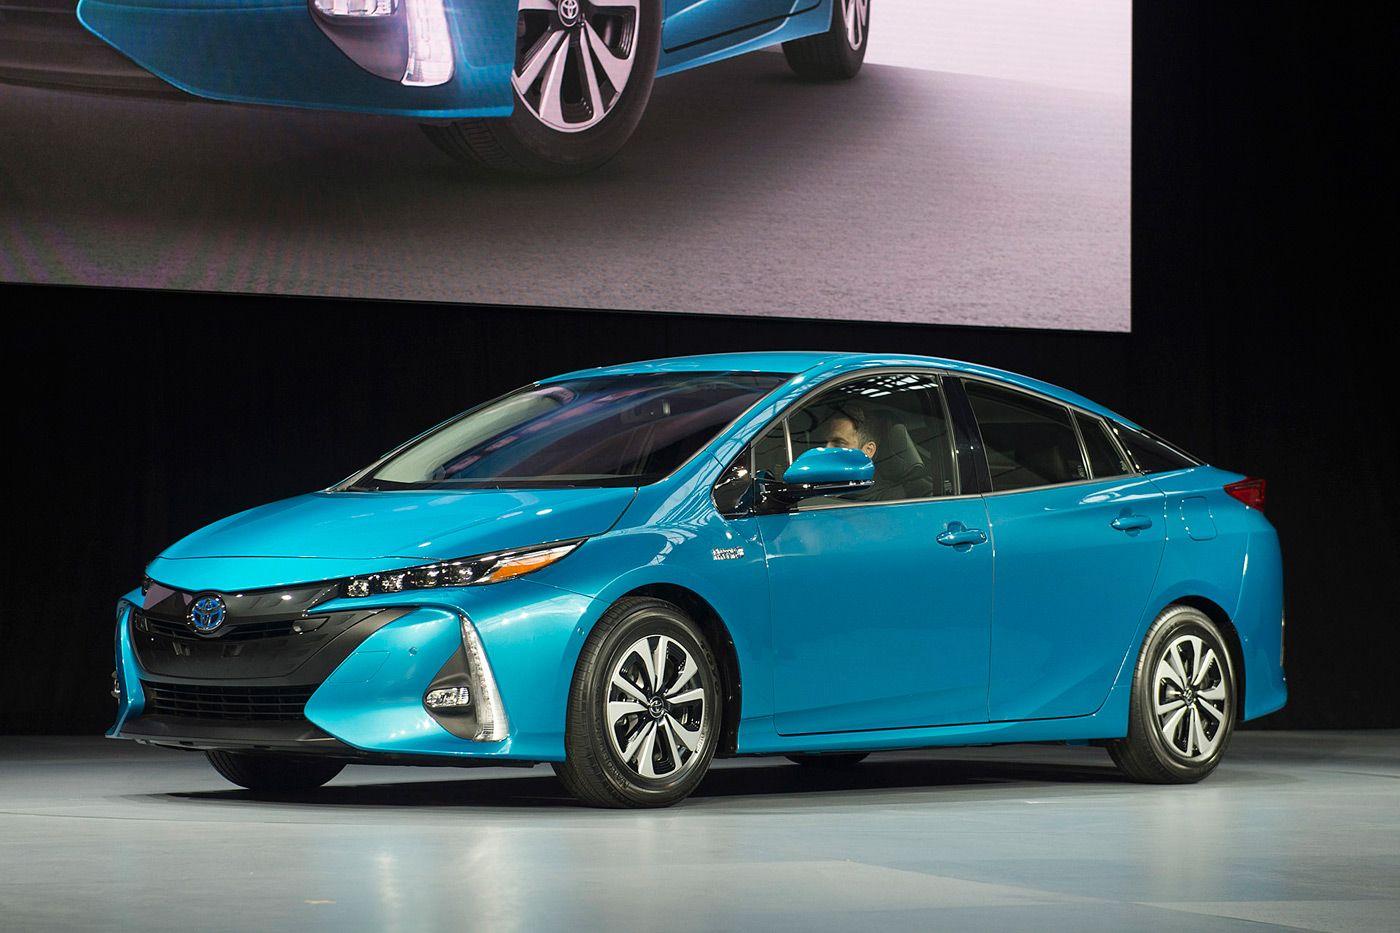 Toyota S Prius Prime Plug In Hybrid Touts 120mpg Toyota Prius